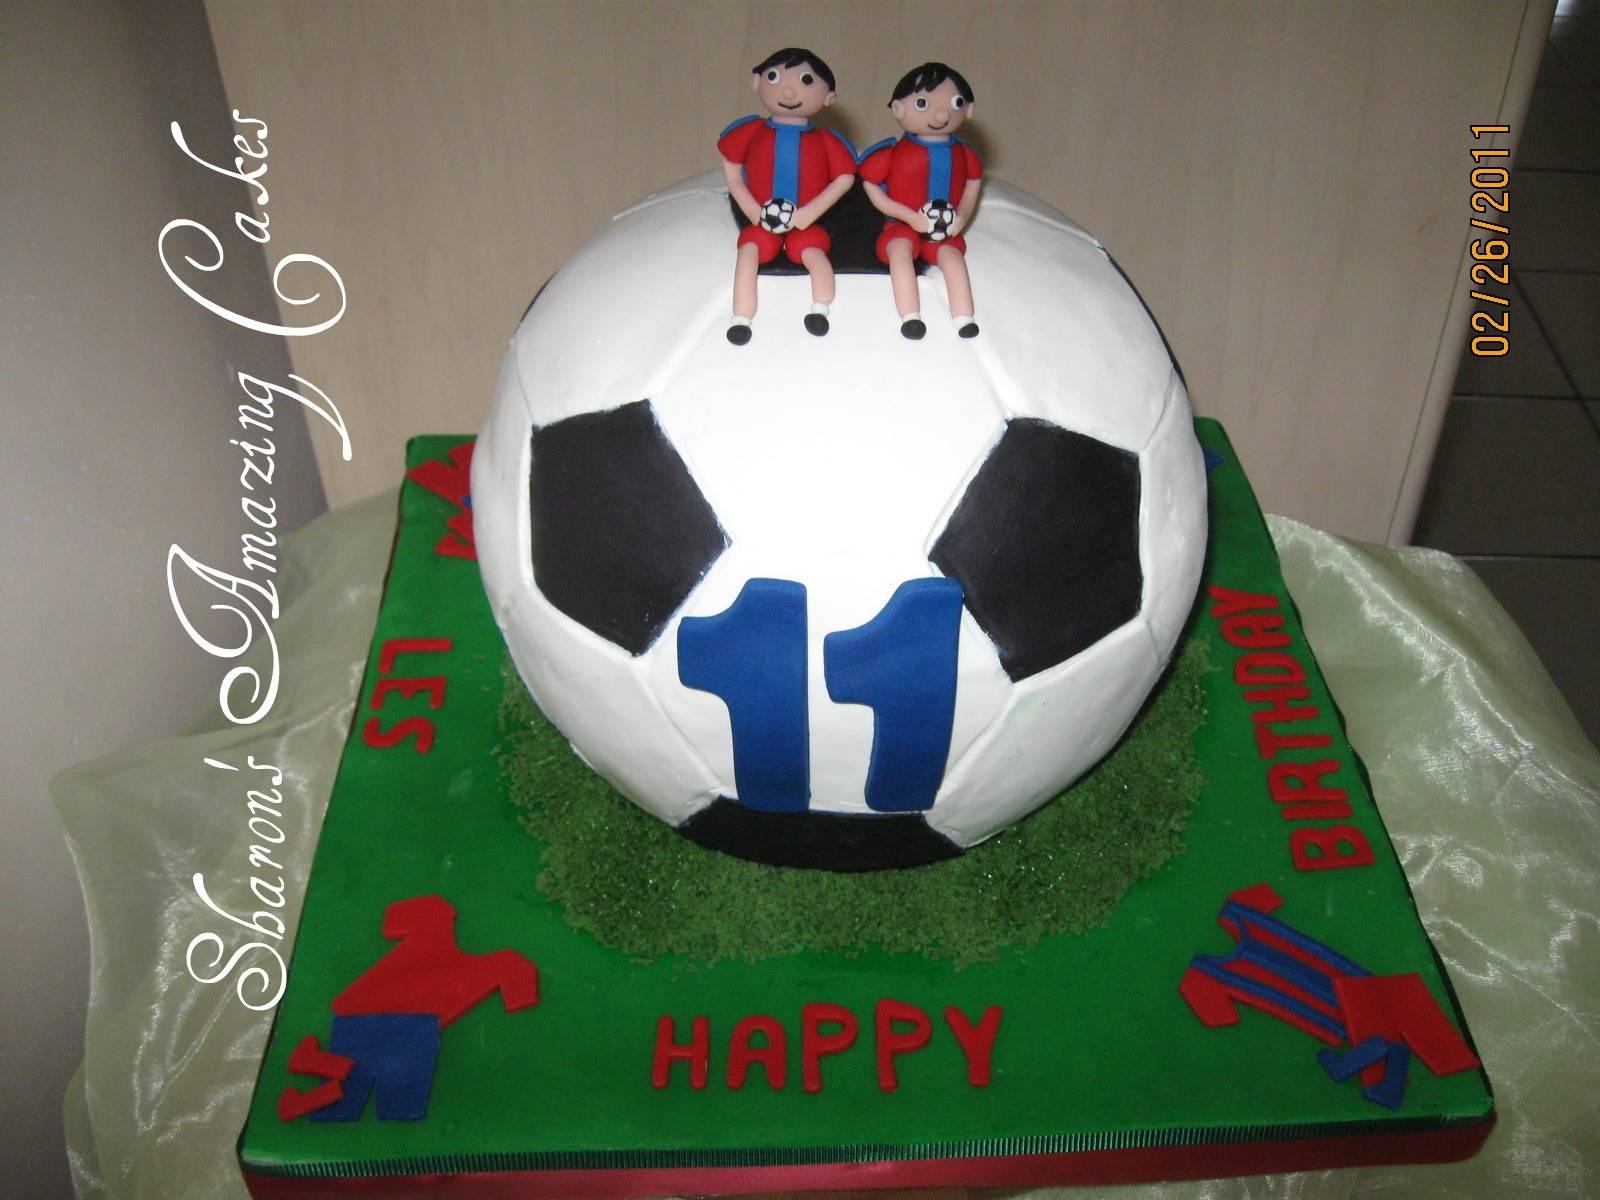 CAKE 24A1 -Football Cake